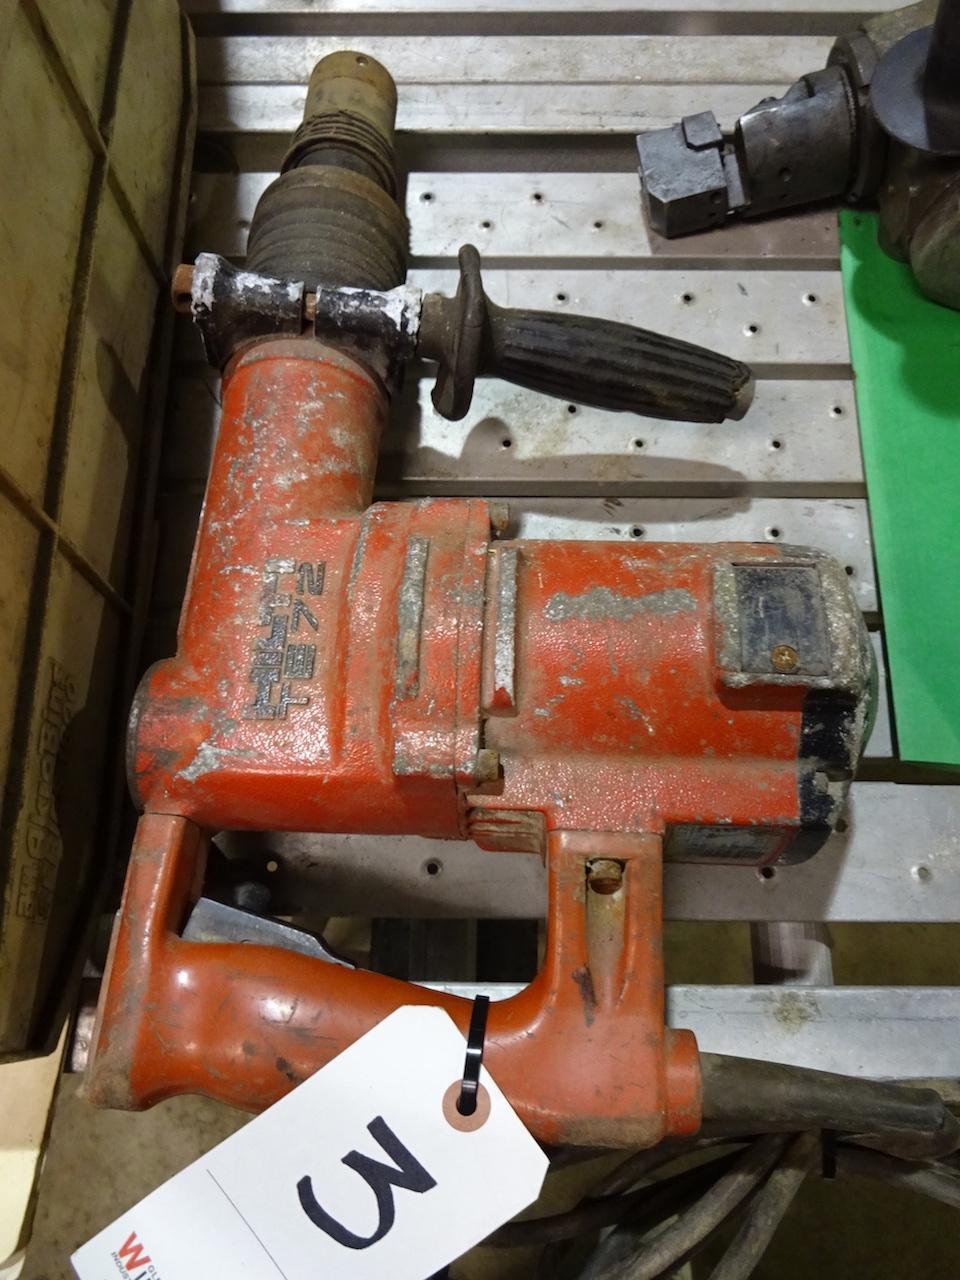 Lot 3 - Hilti Model TE72 Rotary Hammer Drill